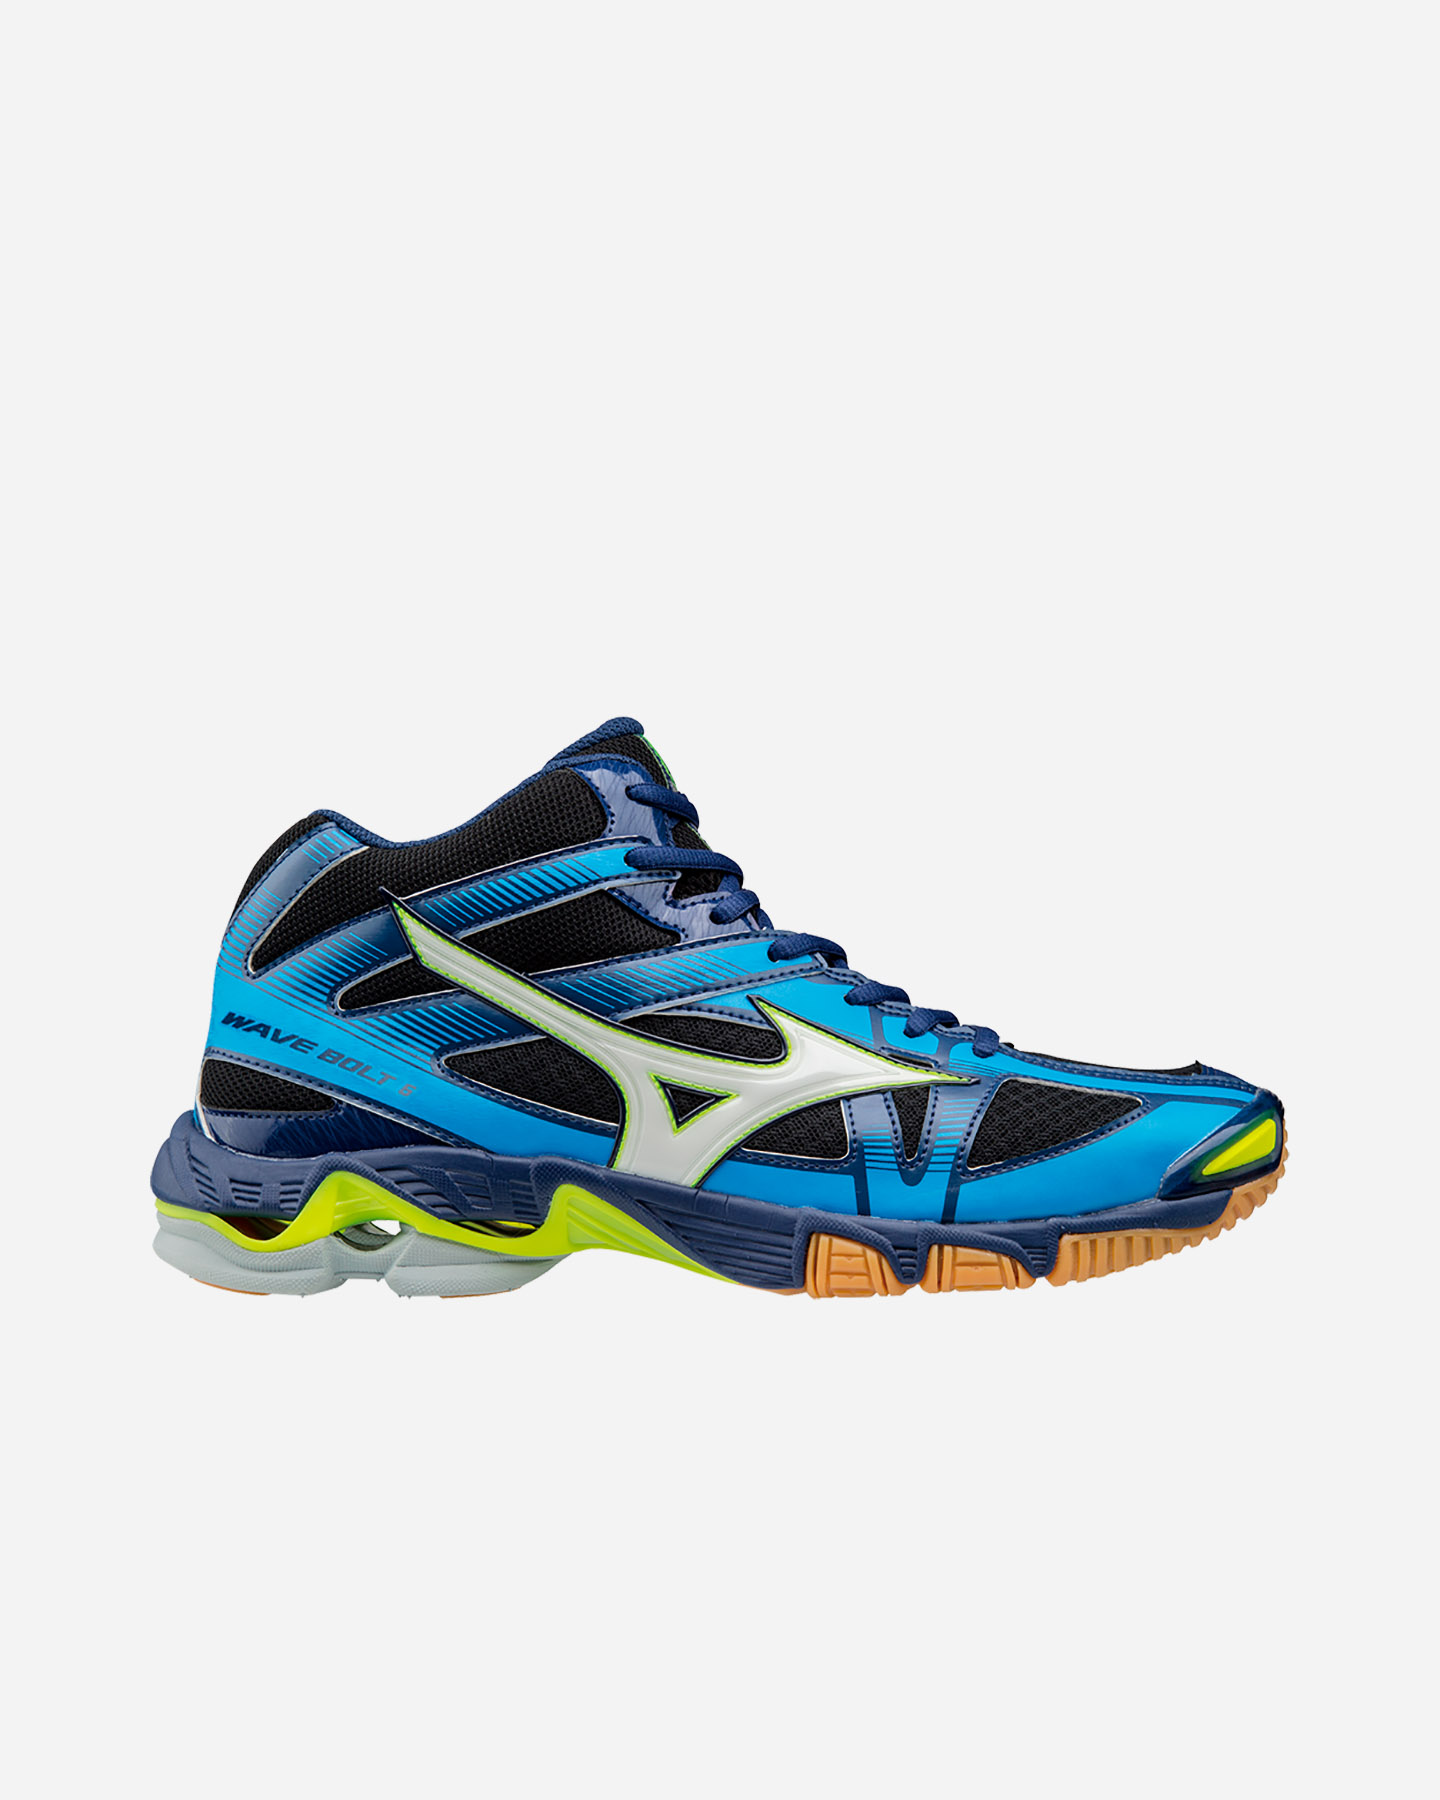 MizunoWave Bolt 6 Mens Volleyball Shoes - Wave Bolt 6 Scarpe da Pallavolo da Uomo da Uomo 1XIIkK